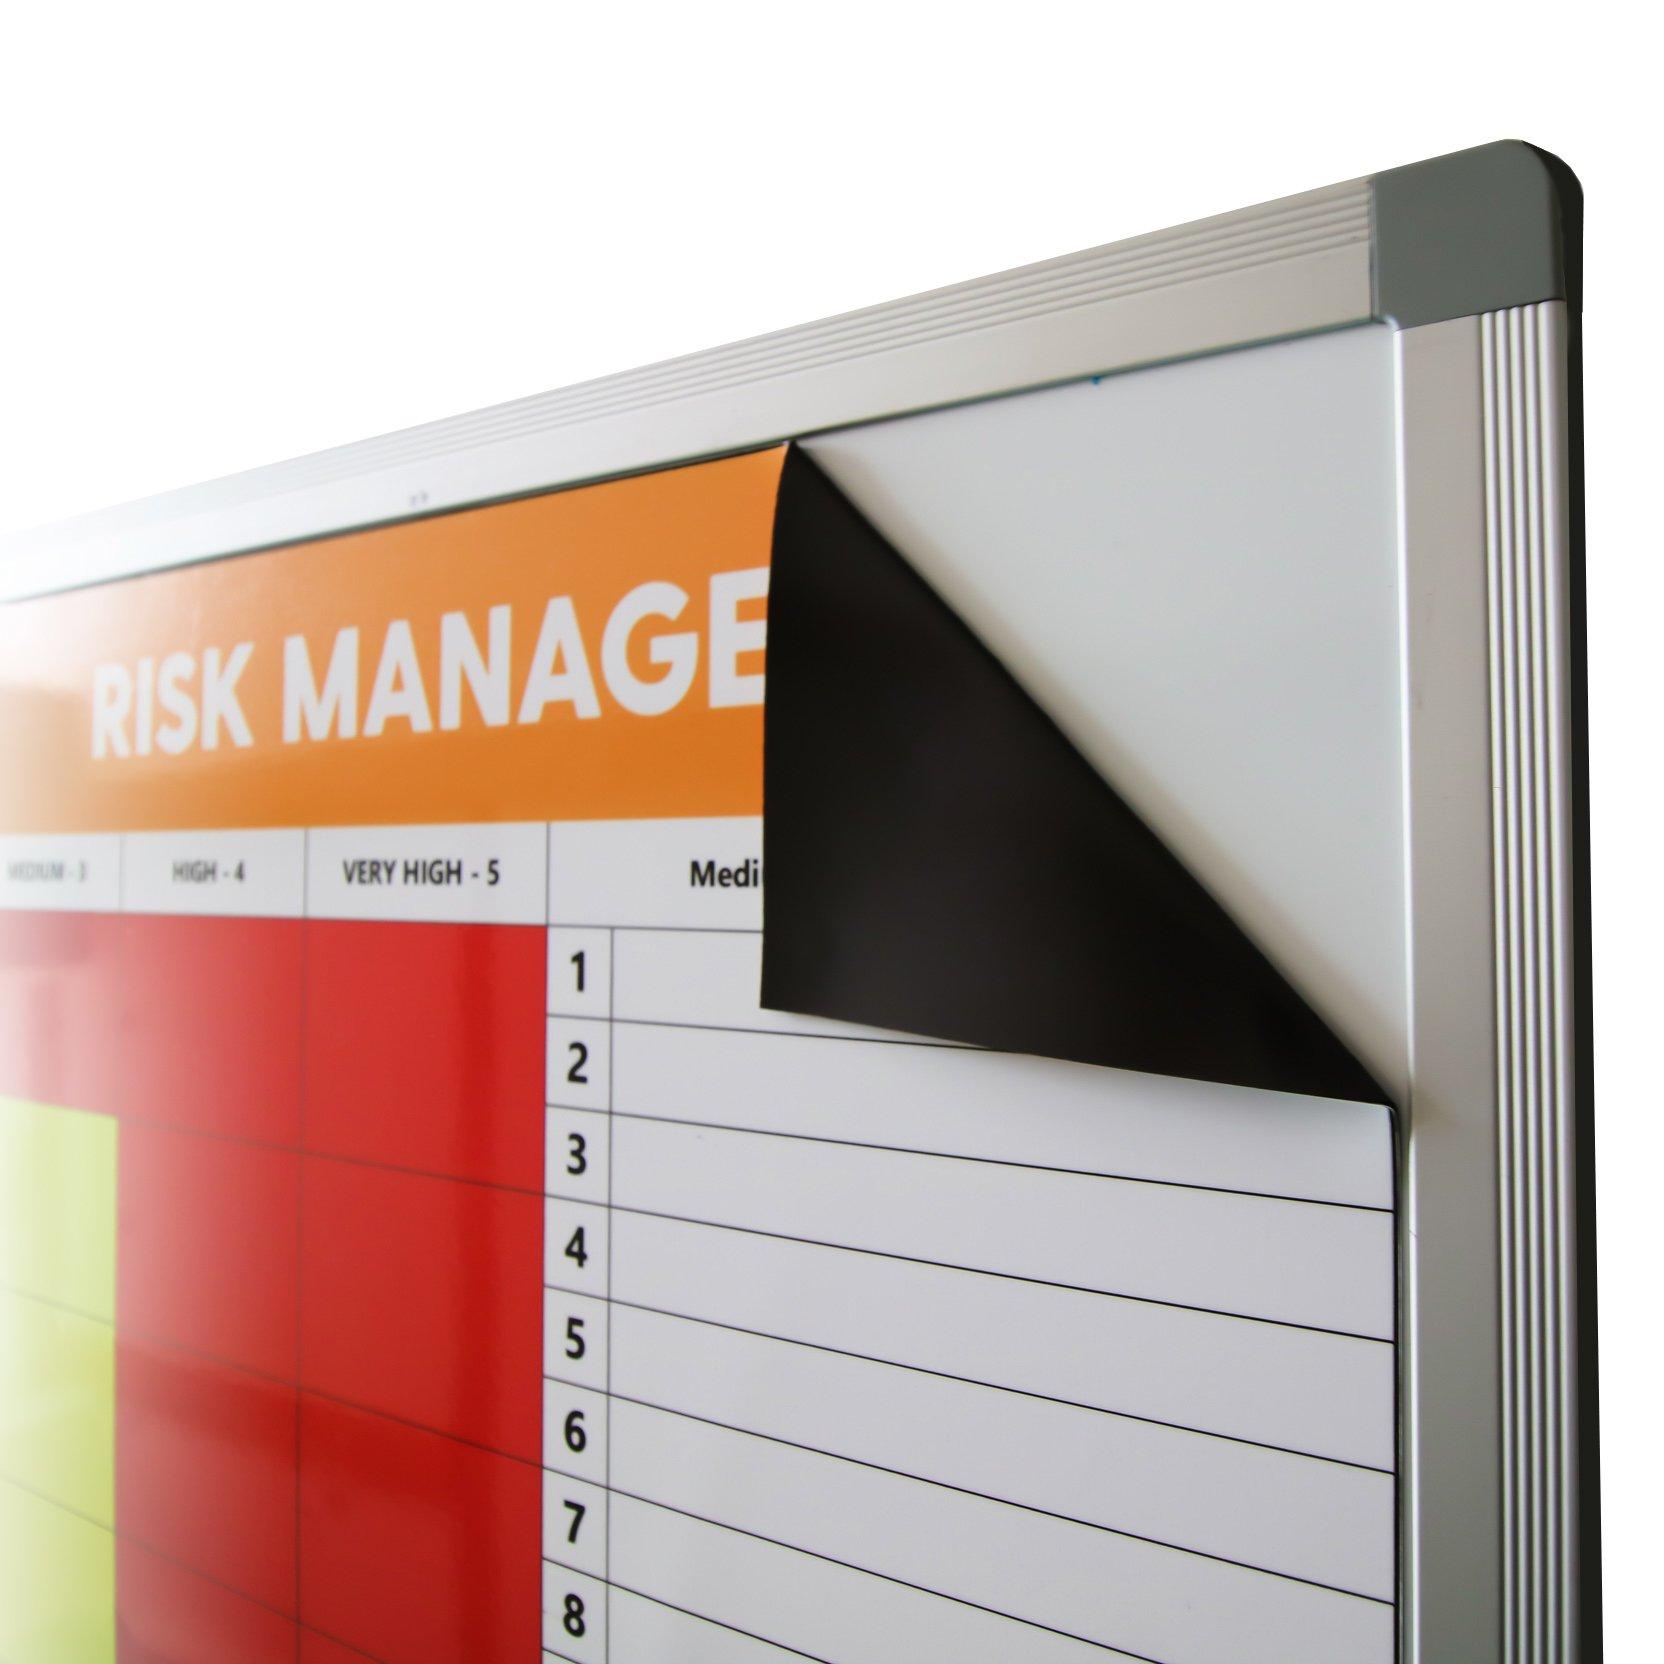 Magnetic Overlay on Whiteboard